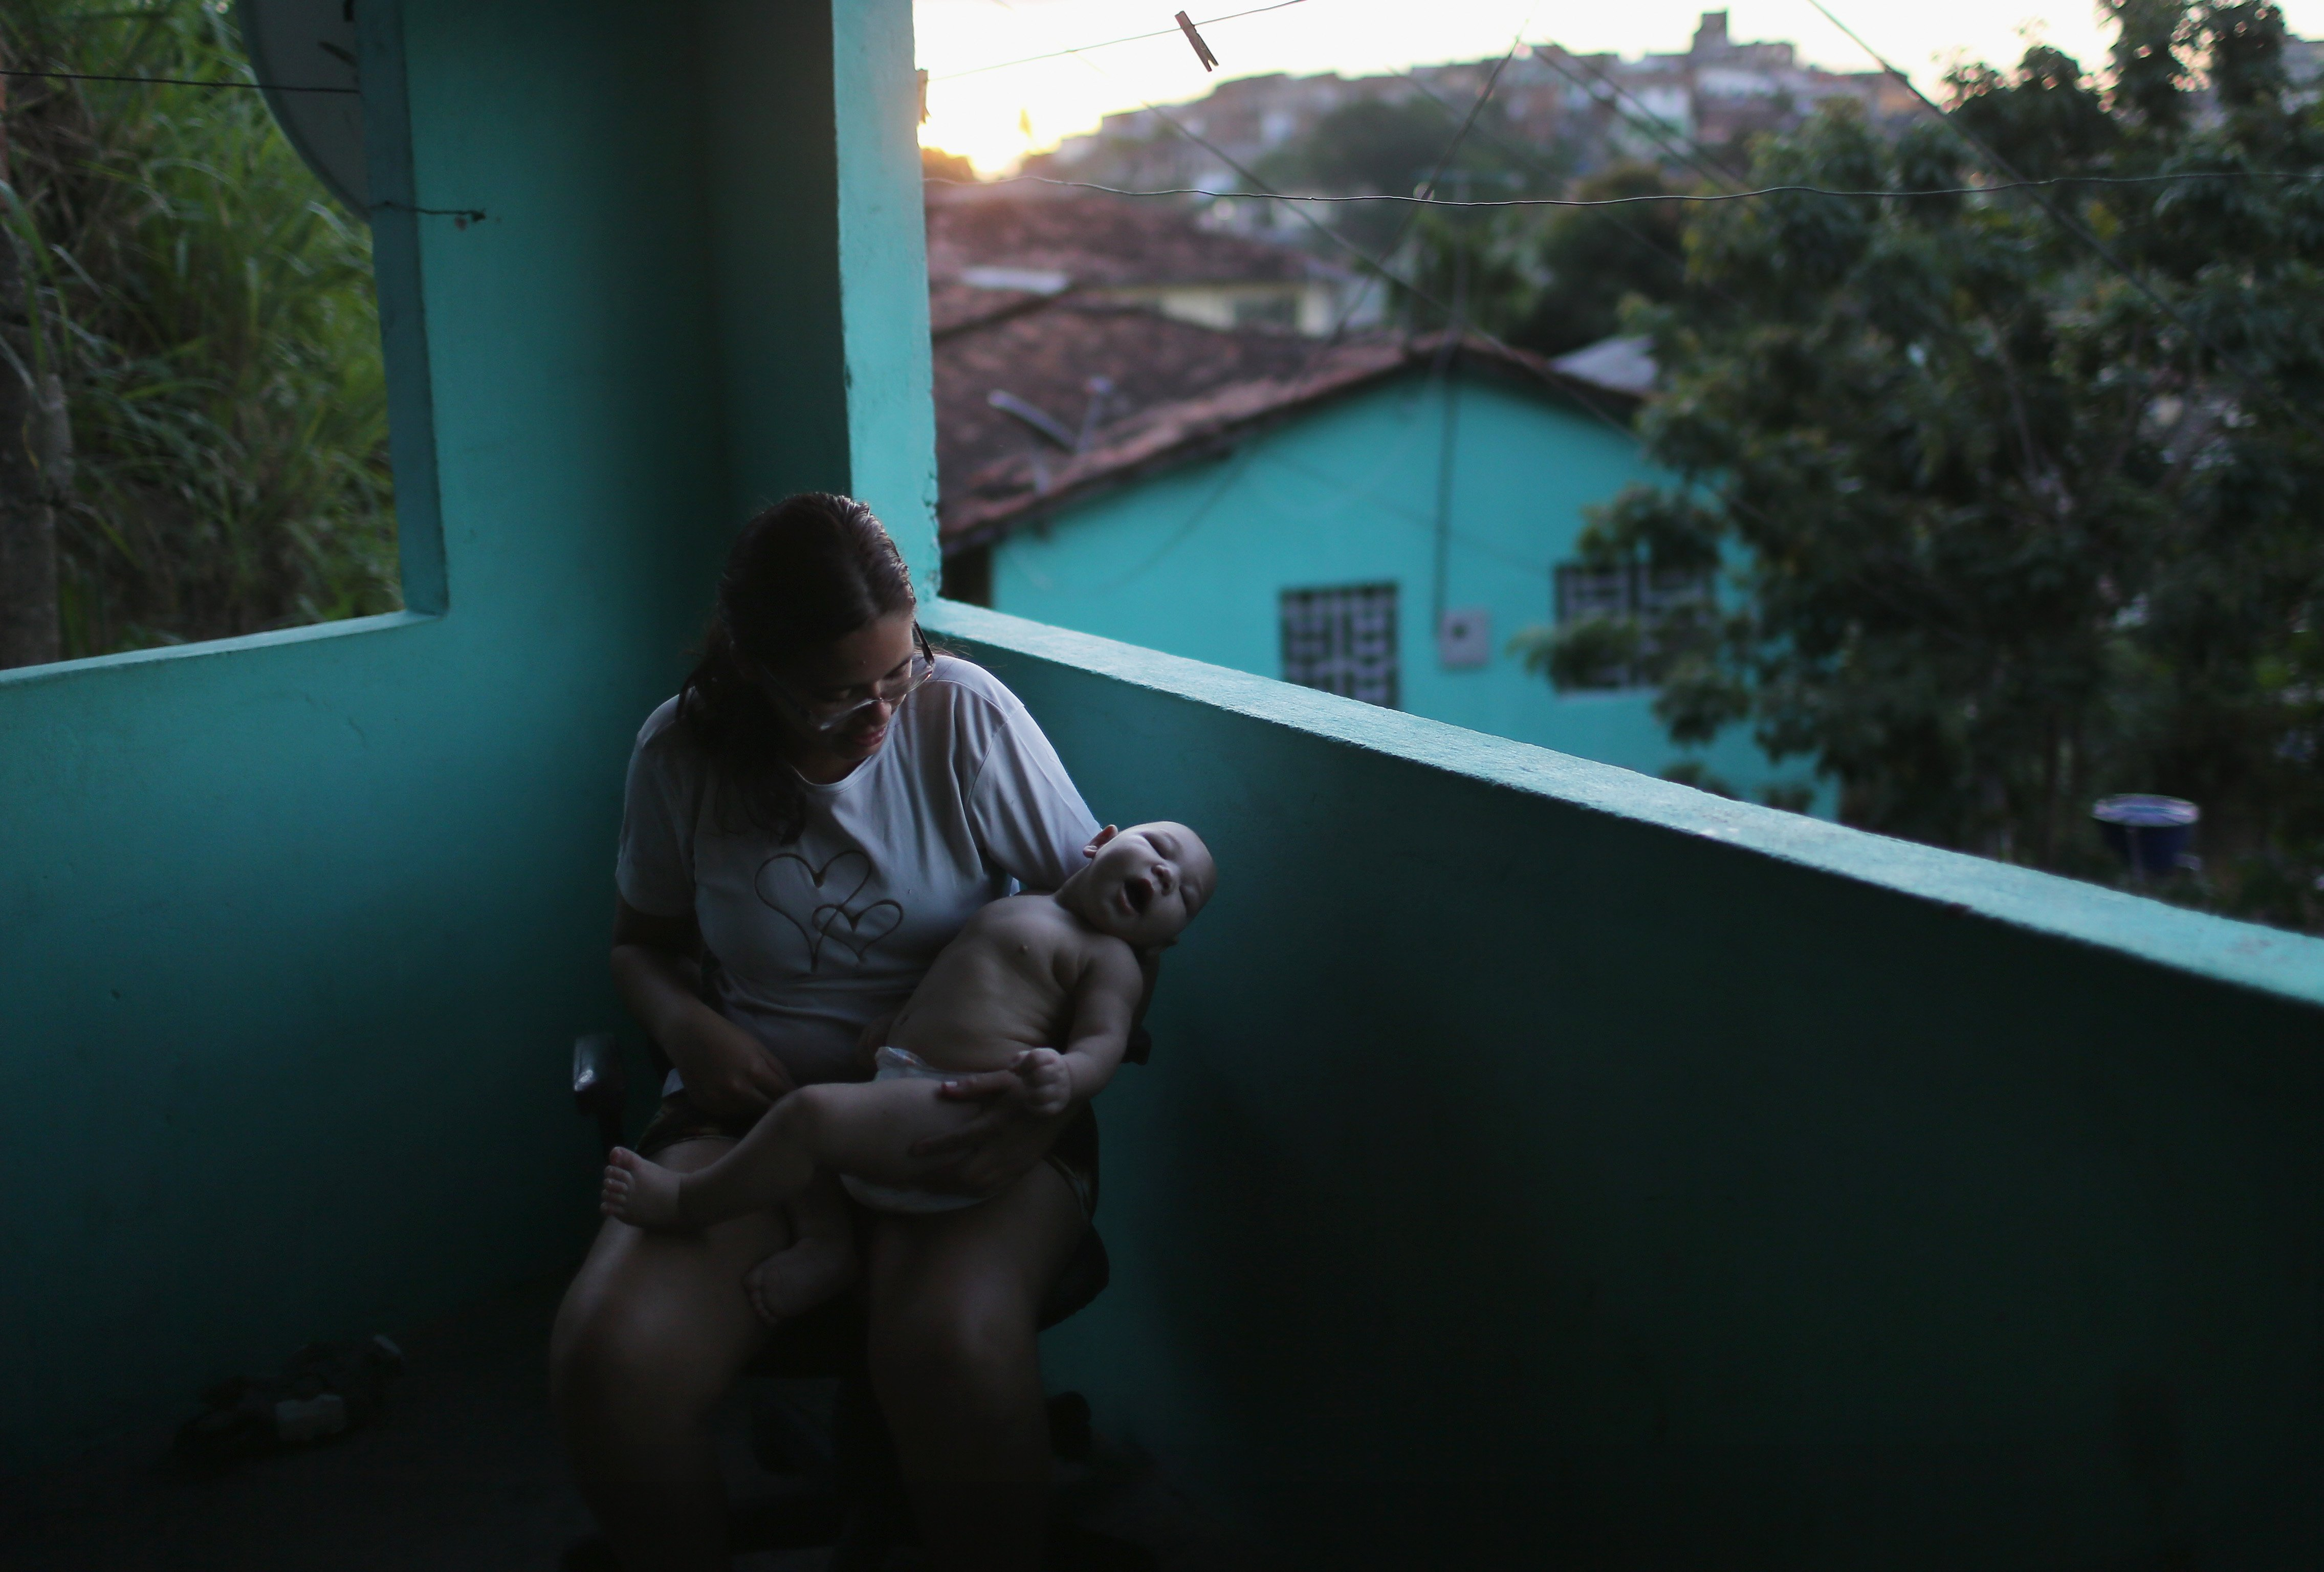 Mylene Helena Ferreira holds her son David Henrique Ferreira, who has microcephaly, on Jan. 25, 2016 in Recife, Brazil.